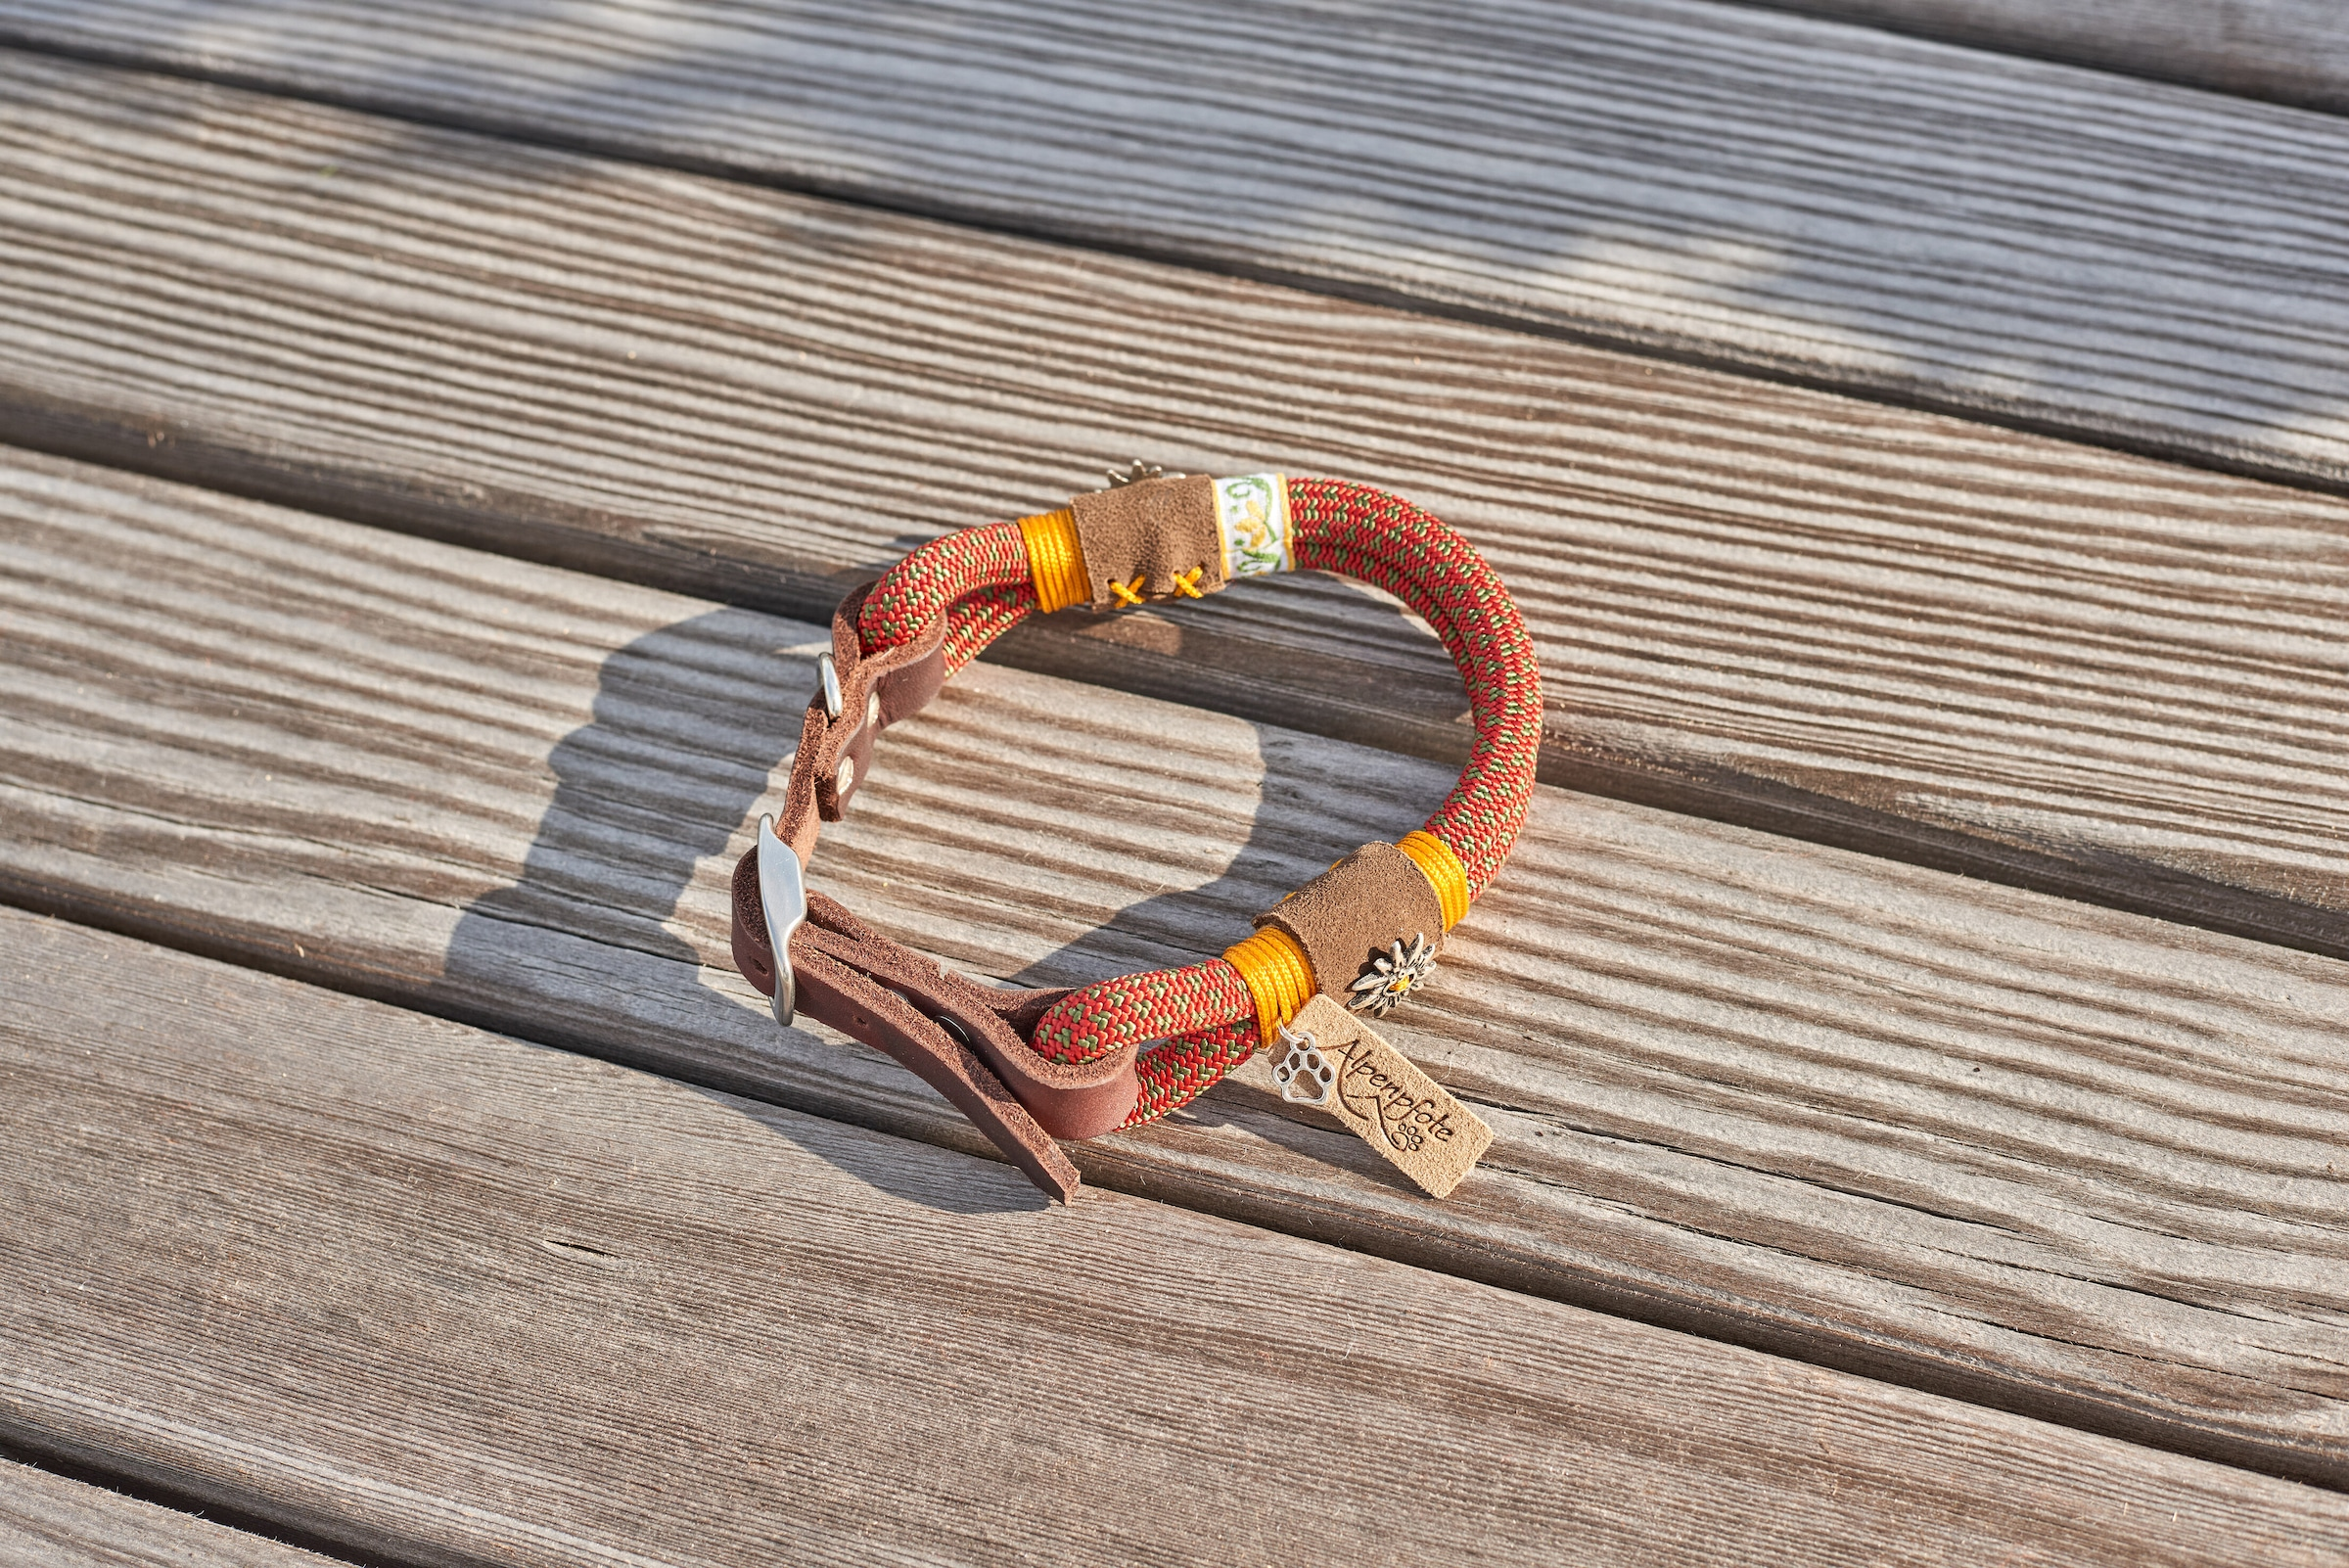 Image of Alpenpfote Hunde-Halsband, Textil-Echtleder, mit drei Stufen verstellbar - Made in Germany